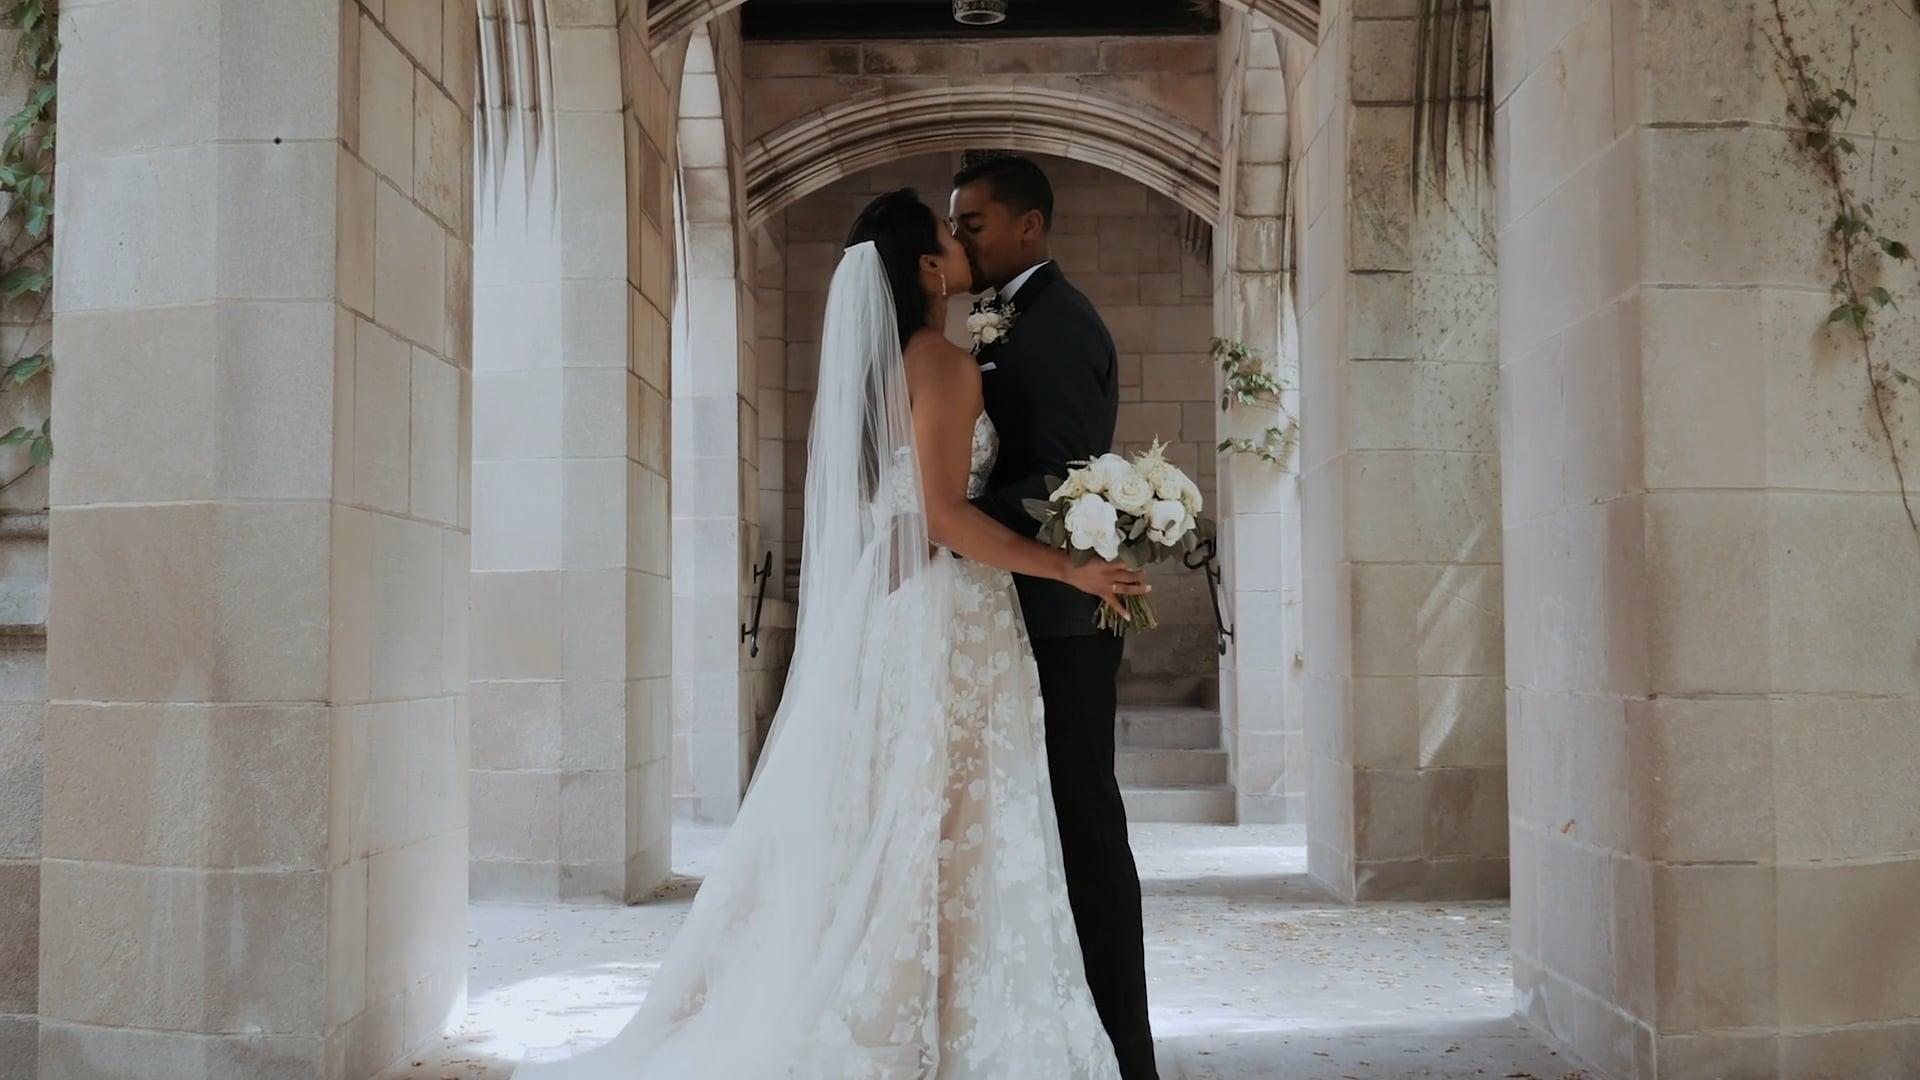 Reina + Donovan   Wedding Day Highlights   5-21-2021   Greenhouse Loft, Chicago, IL